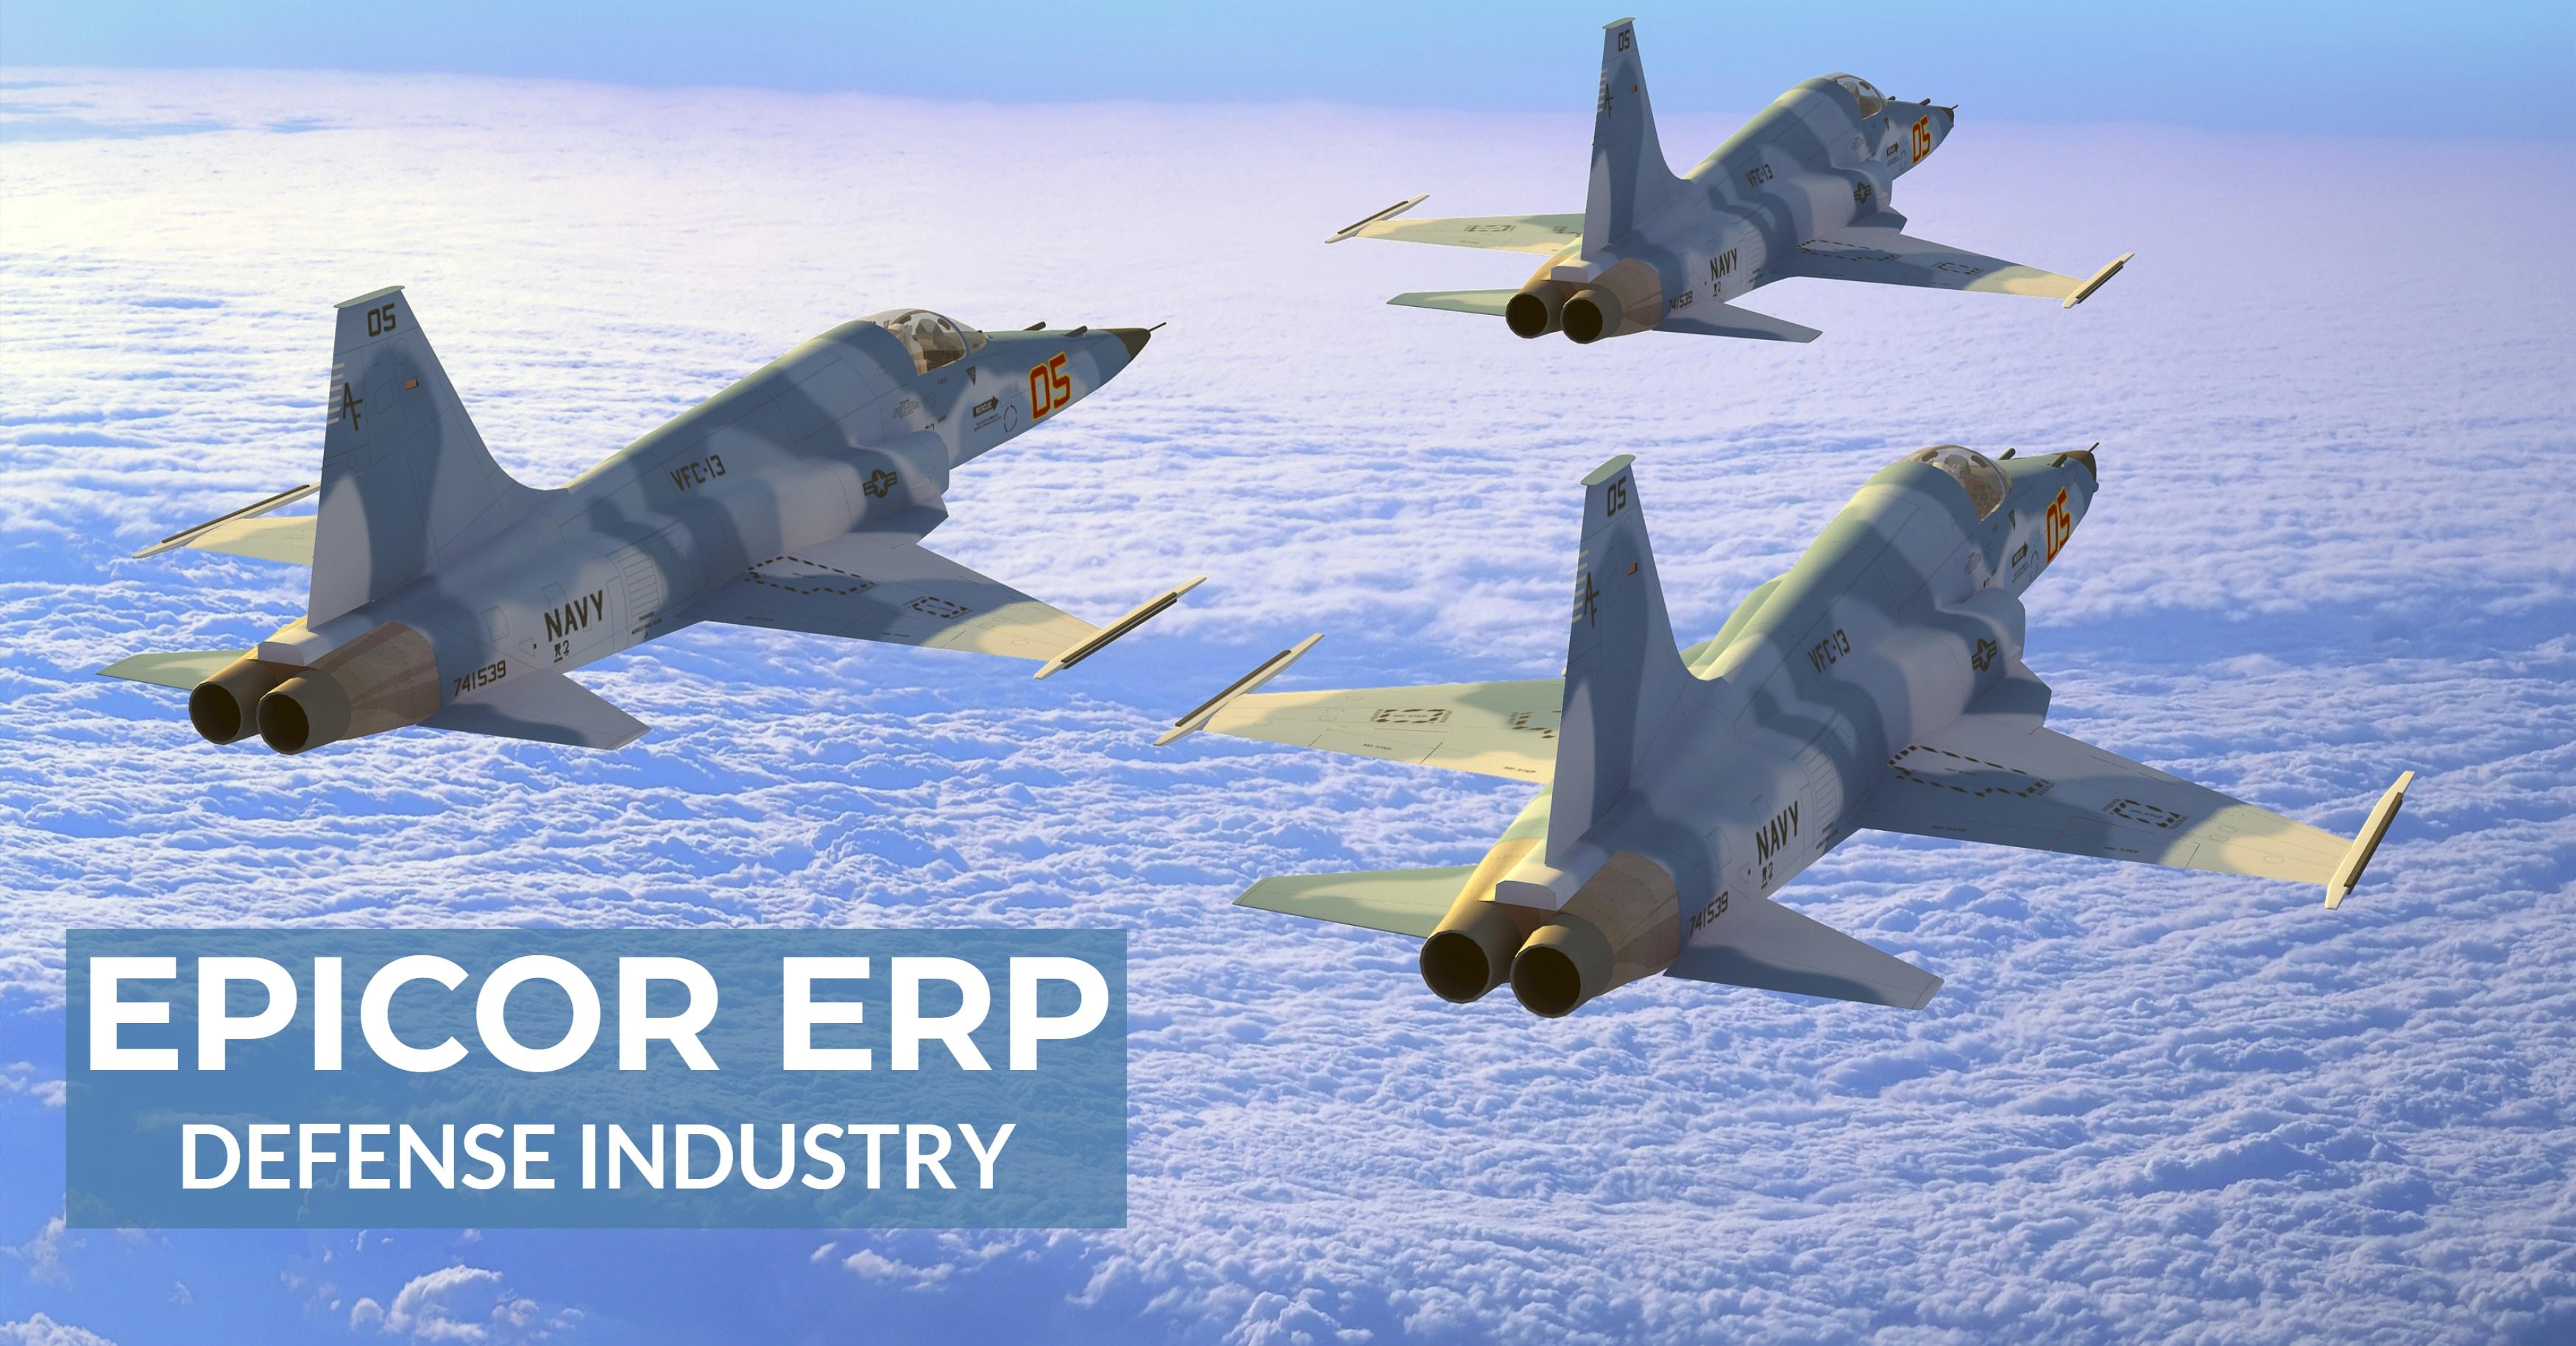 Epicor ERP Defense Industry